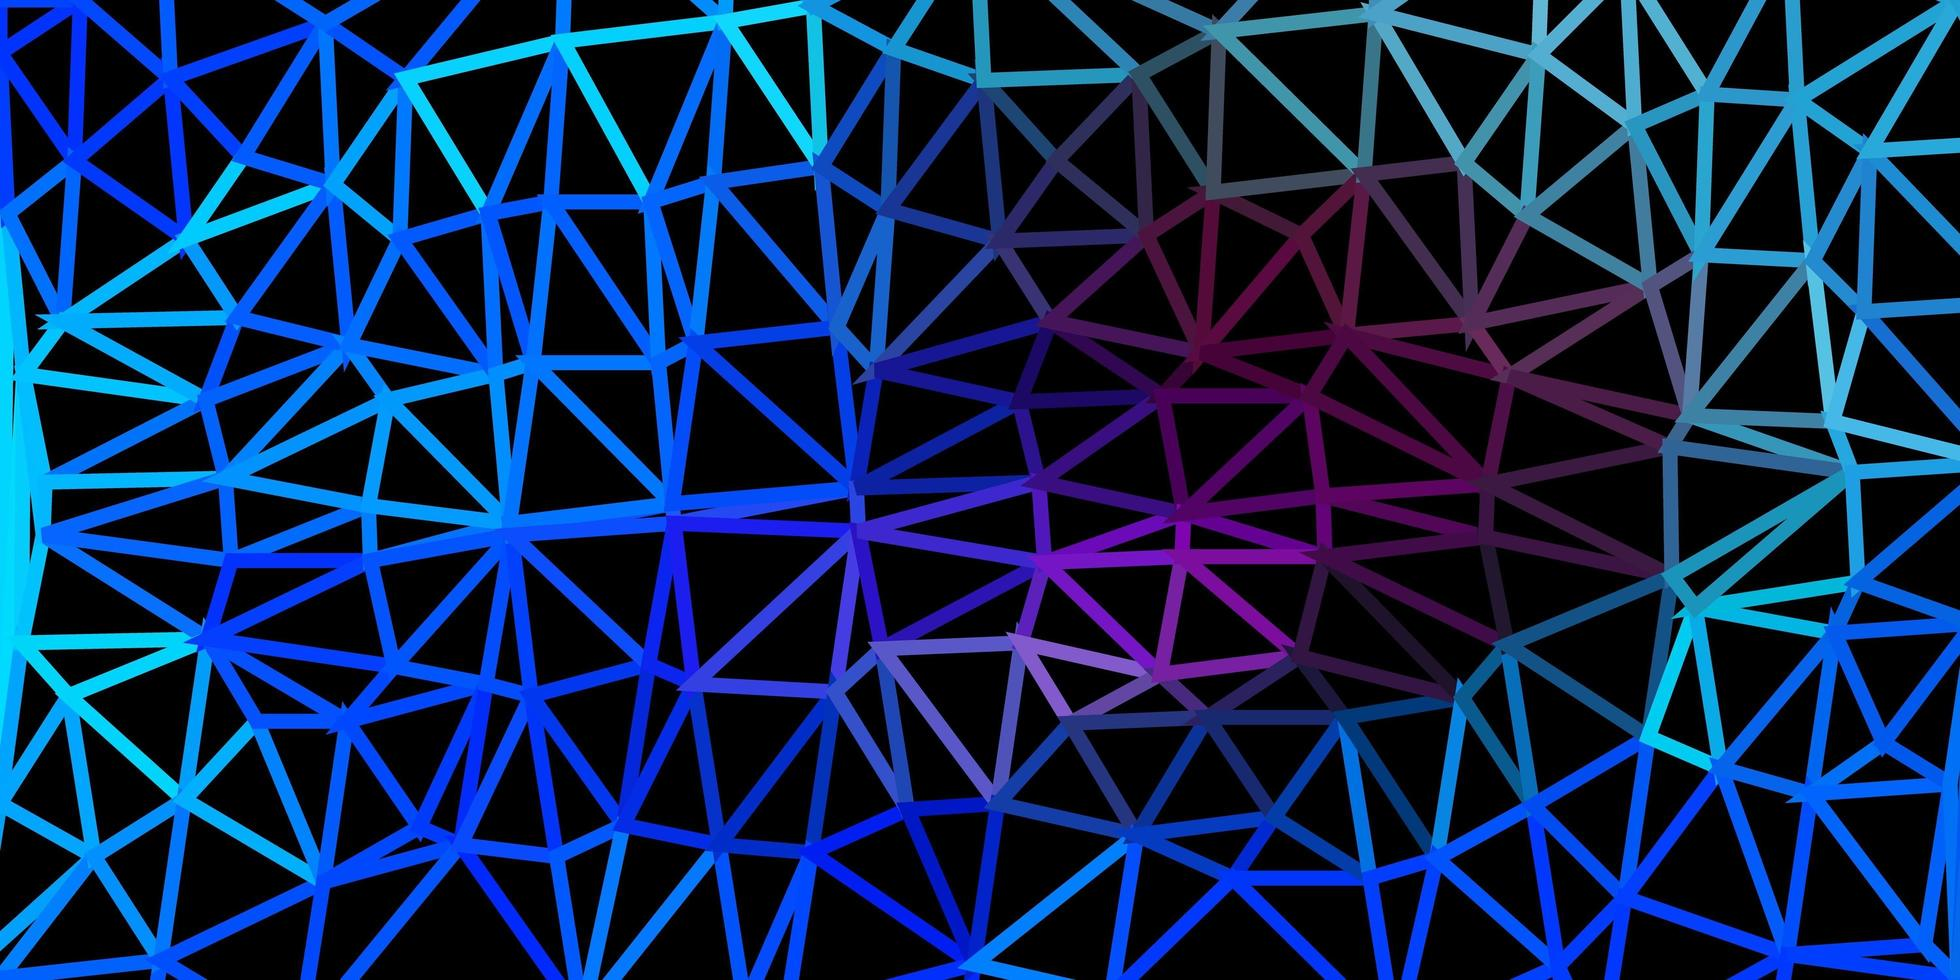 fundo do mosaico do triângulo do vetor rosa escuro, azul.